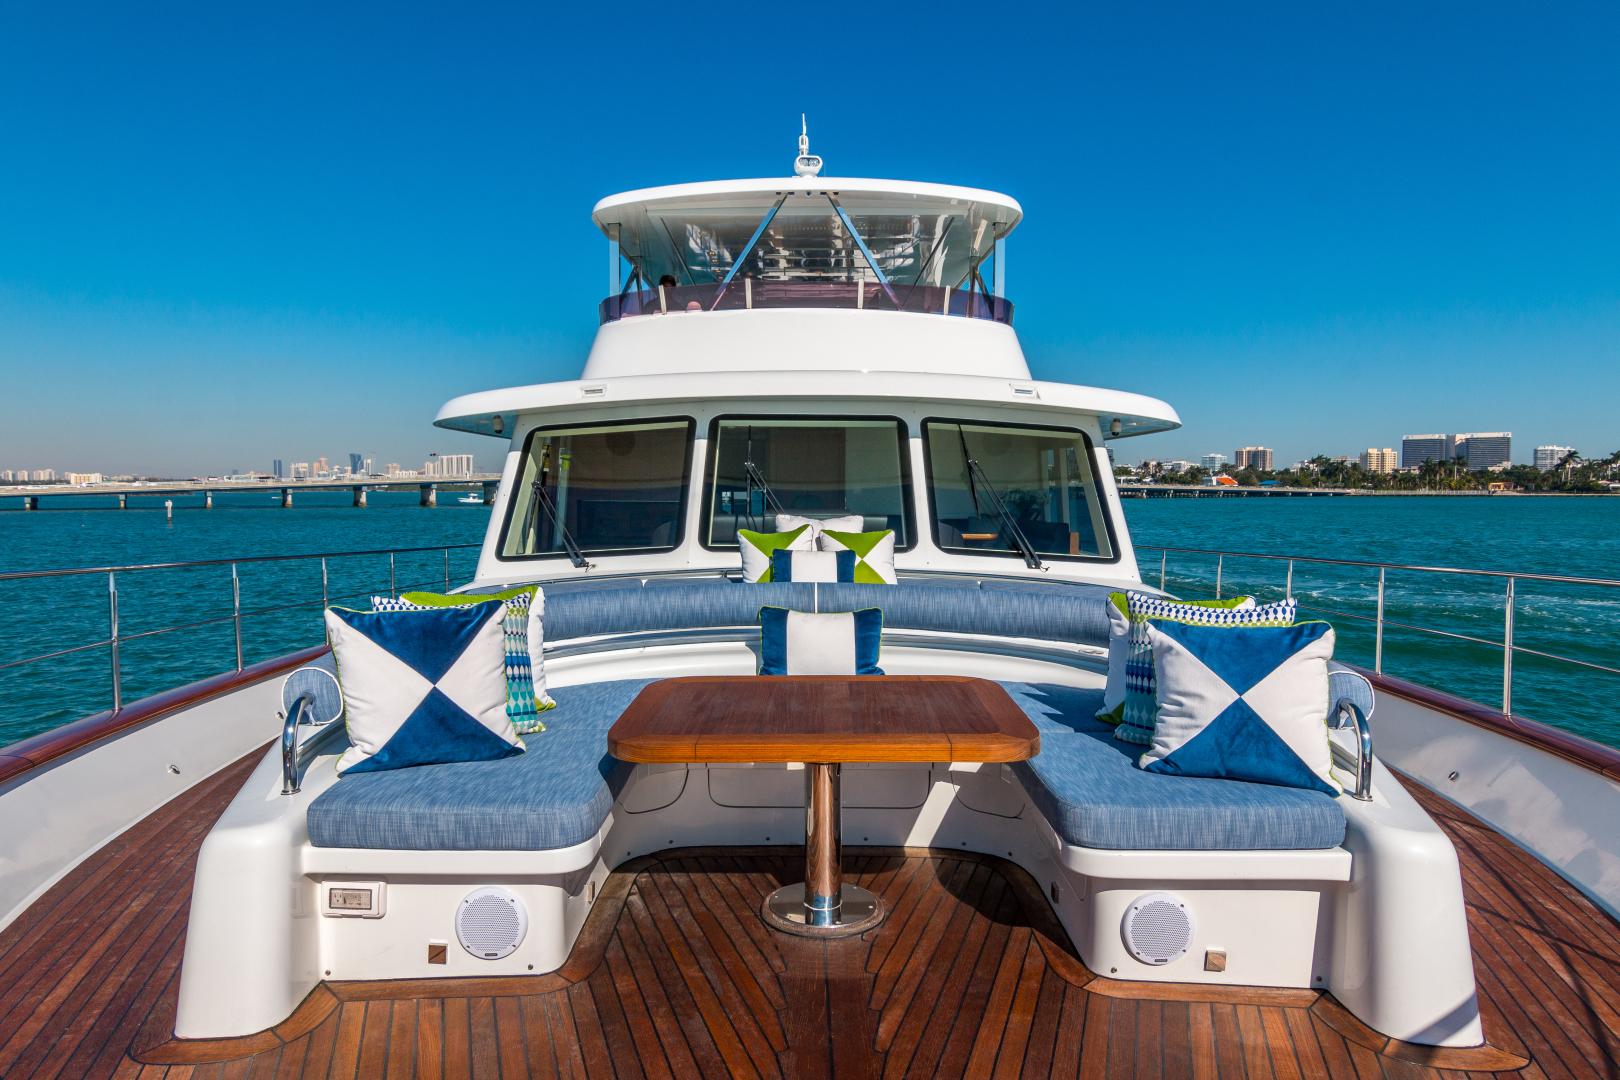 Vicem-Raised Pilot House 2013-MONI FORT LAUDERDALE-Florida-United States-BOW SEATING -1394882 | Thumbnail